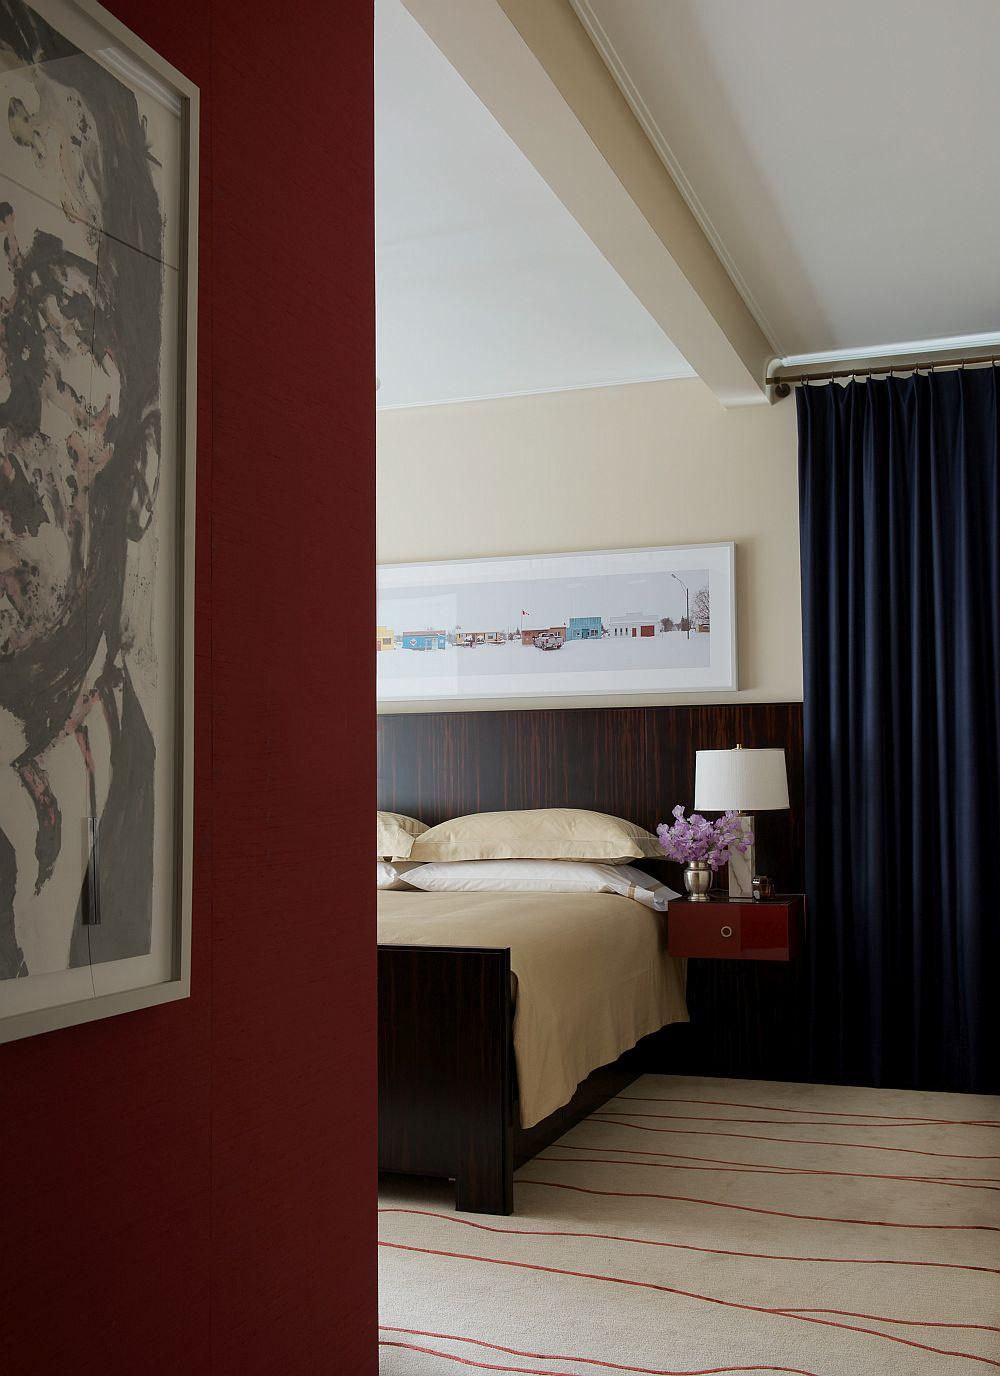 Elegant bedroom with a neutral color scheme